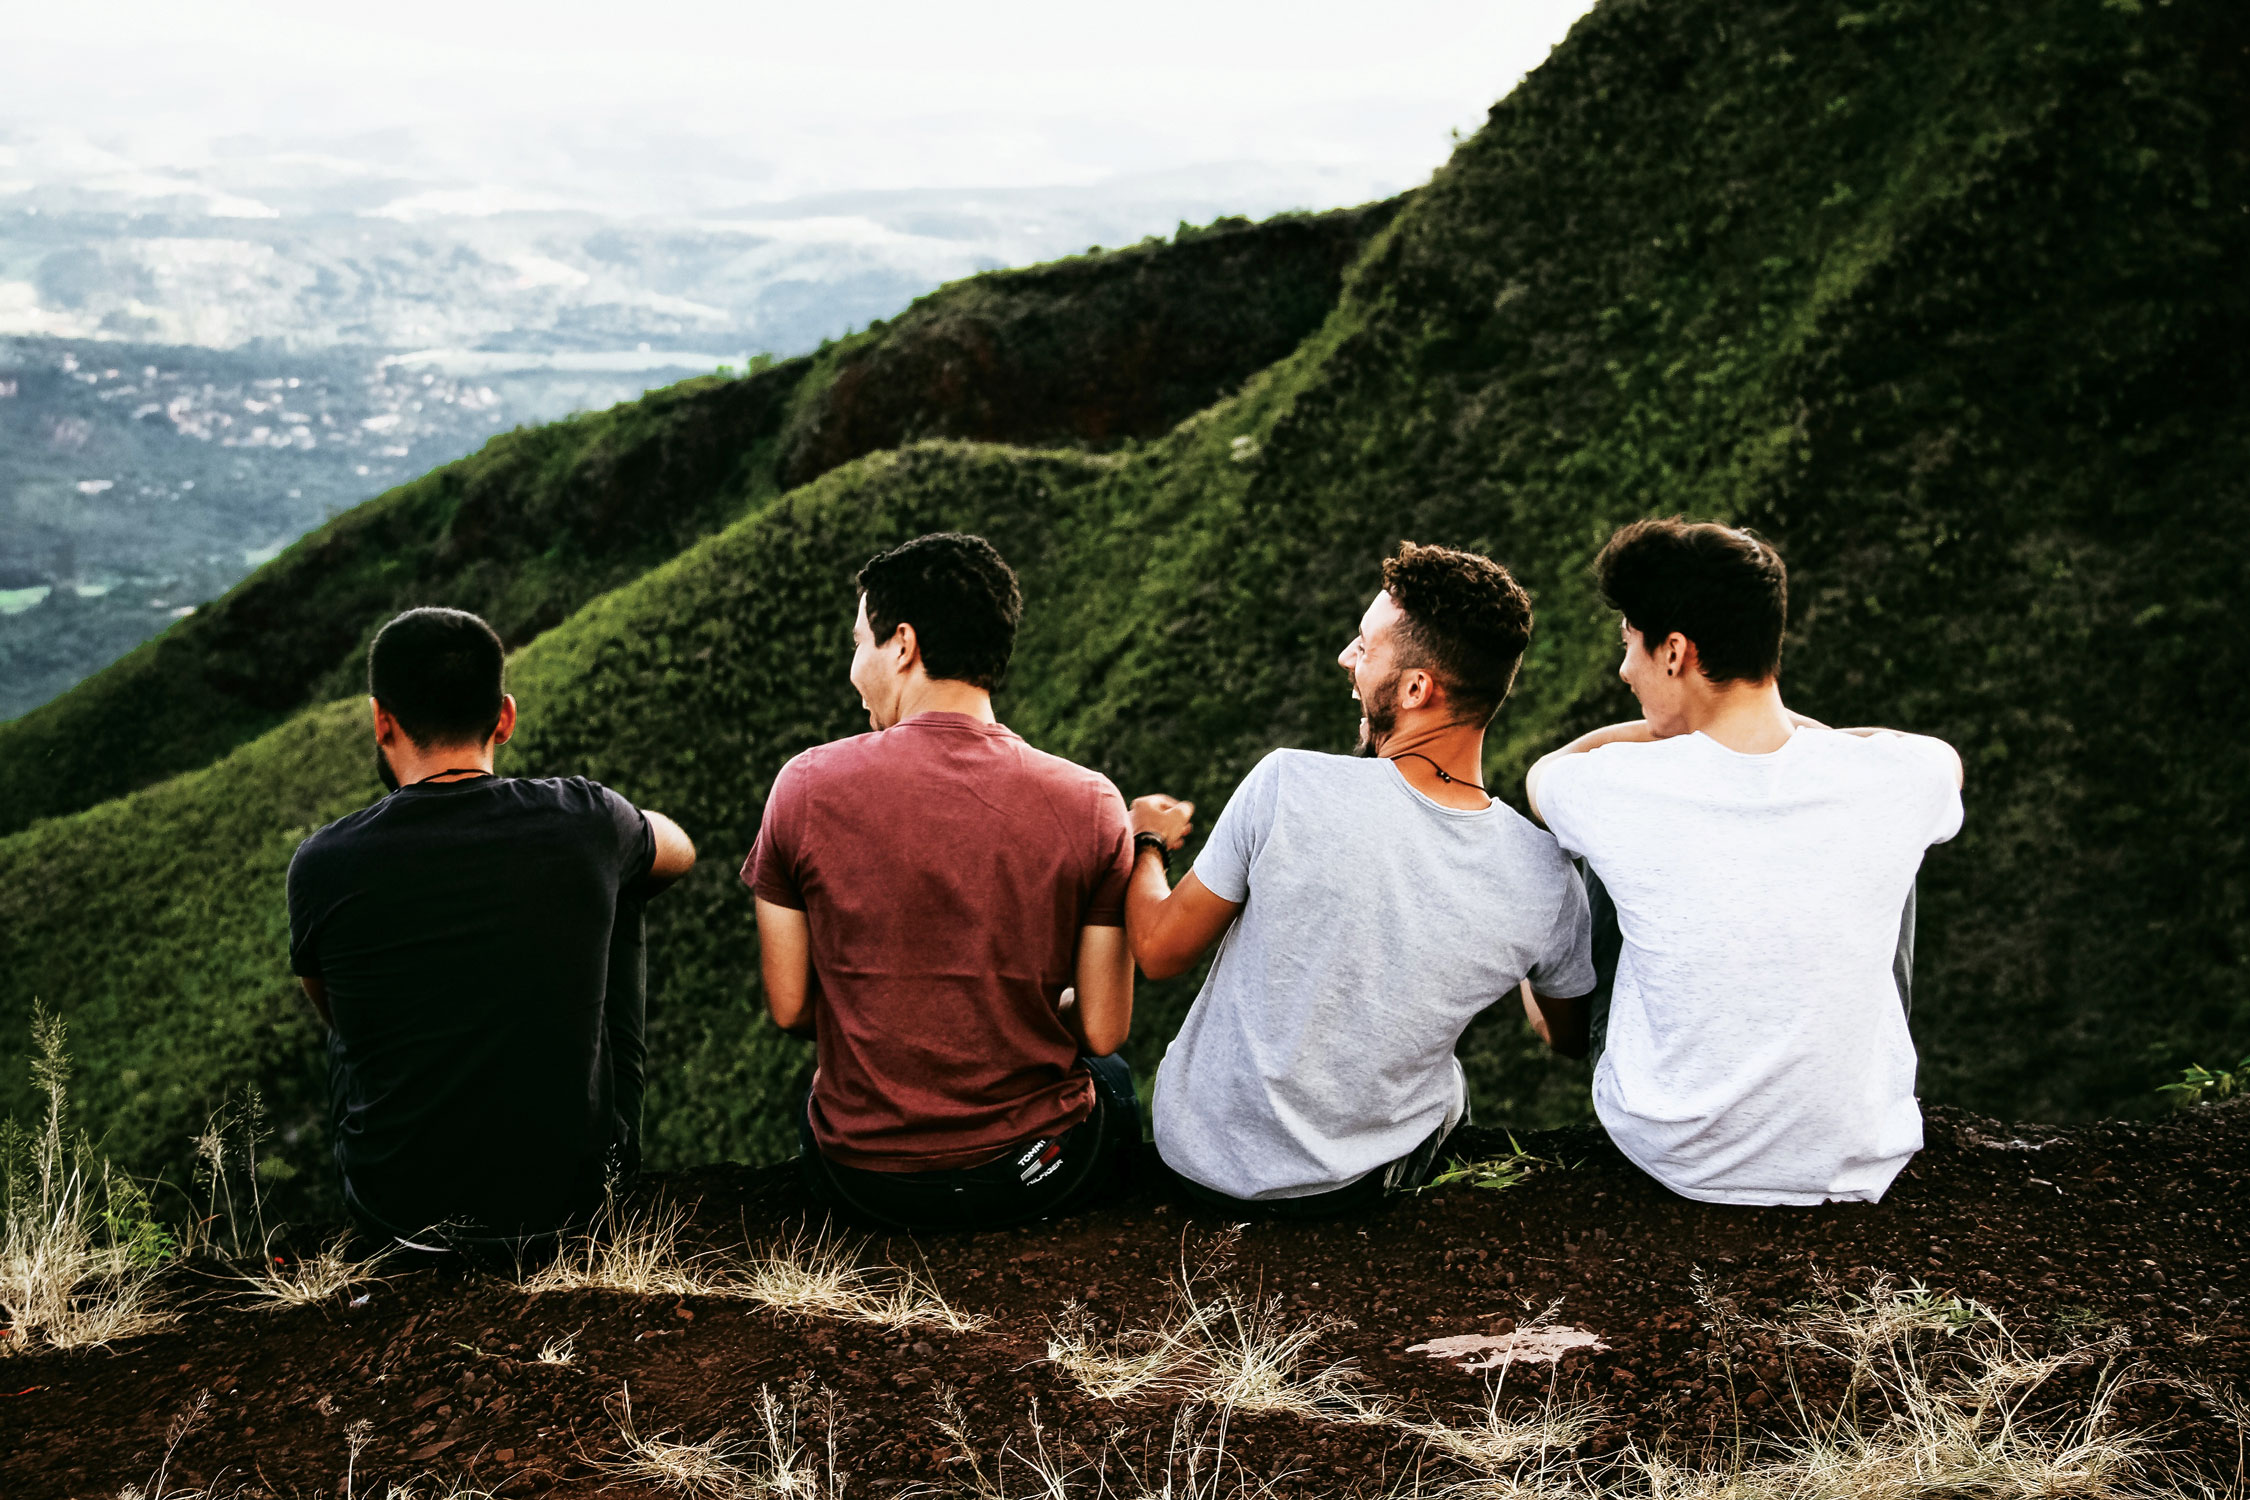 boys-p2-matheus-ferrero-228716-unsplash.jpg